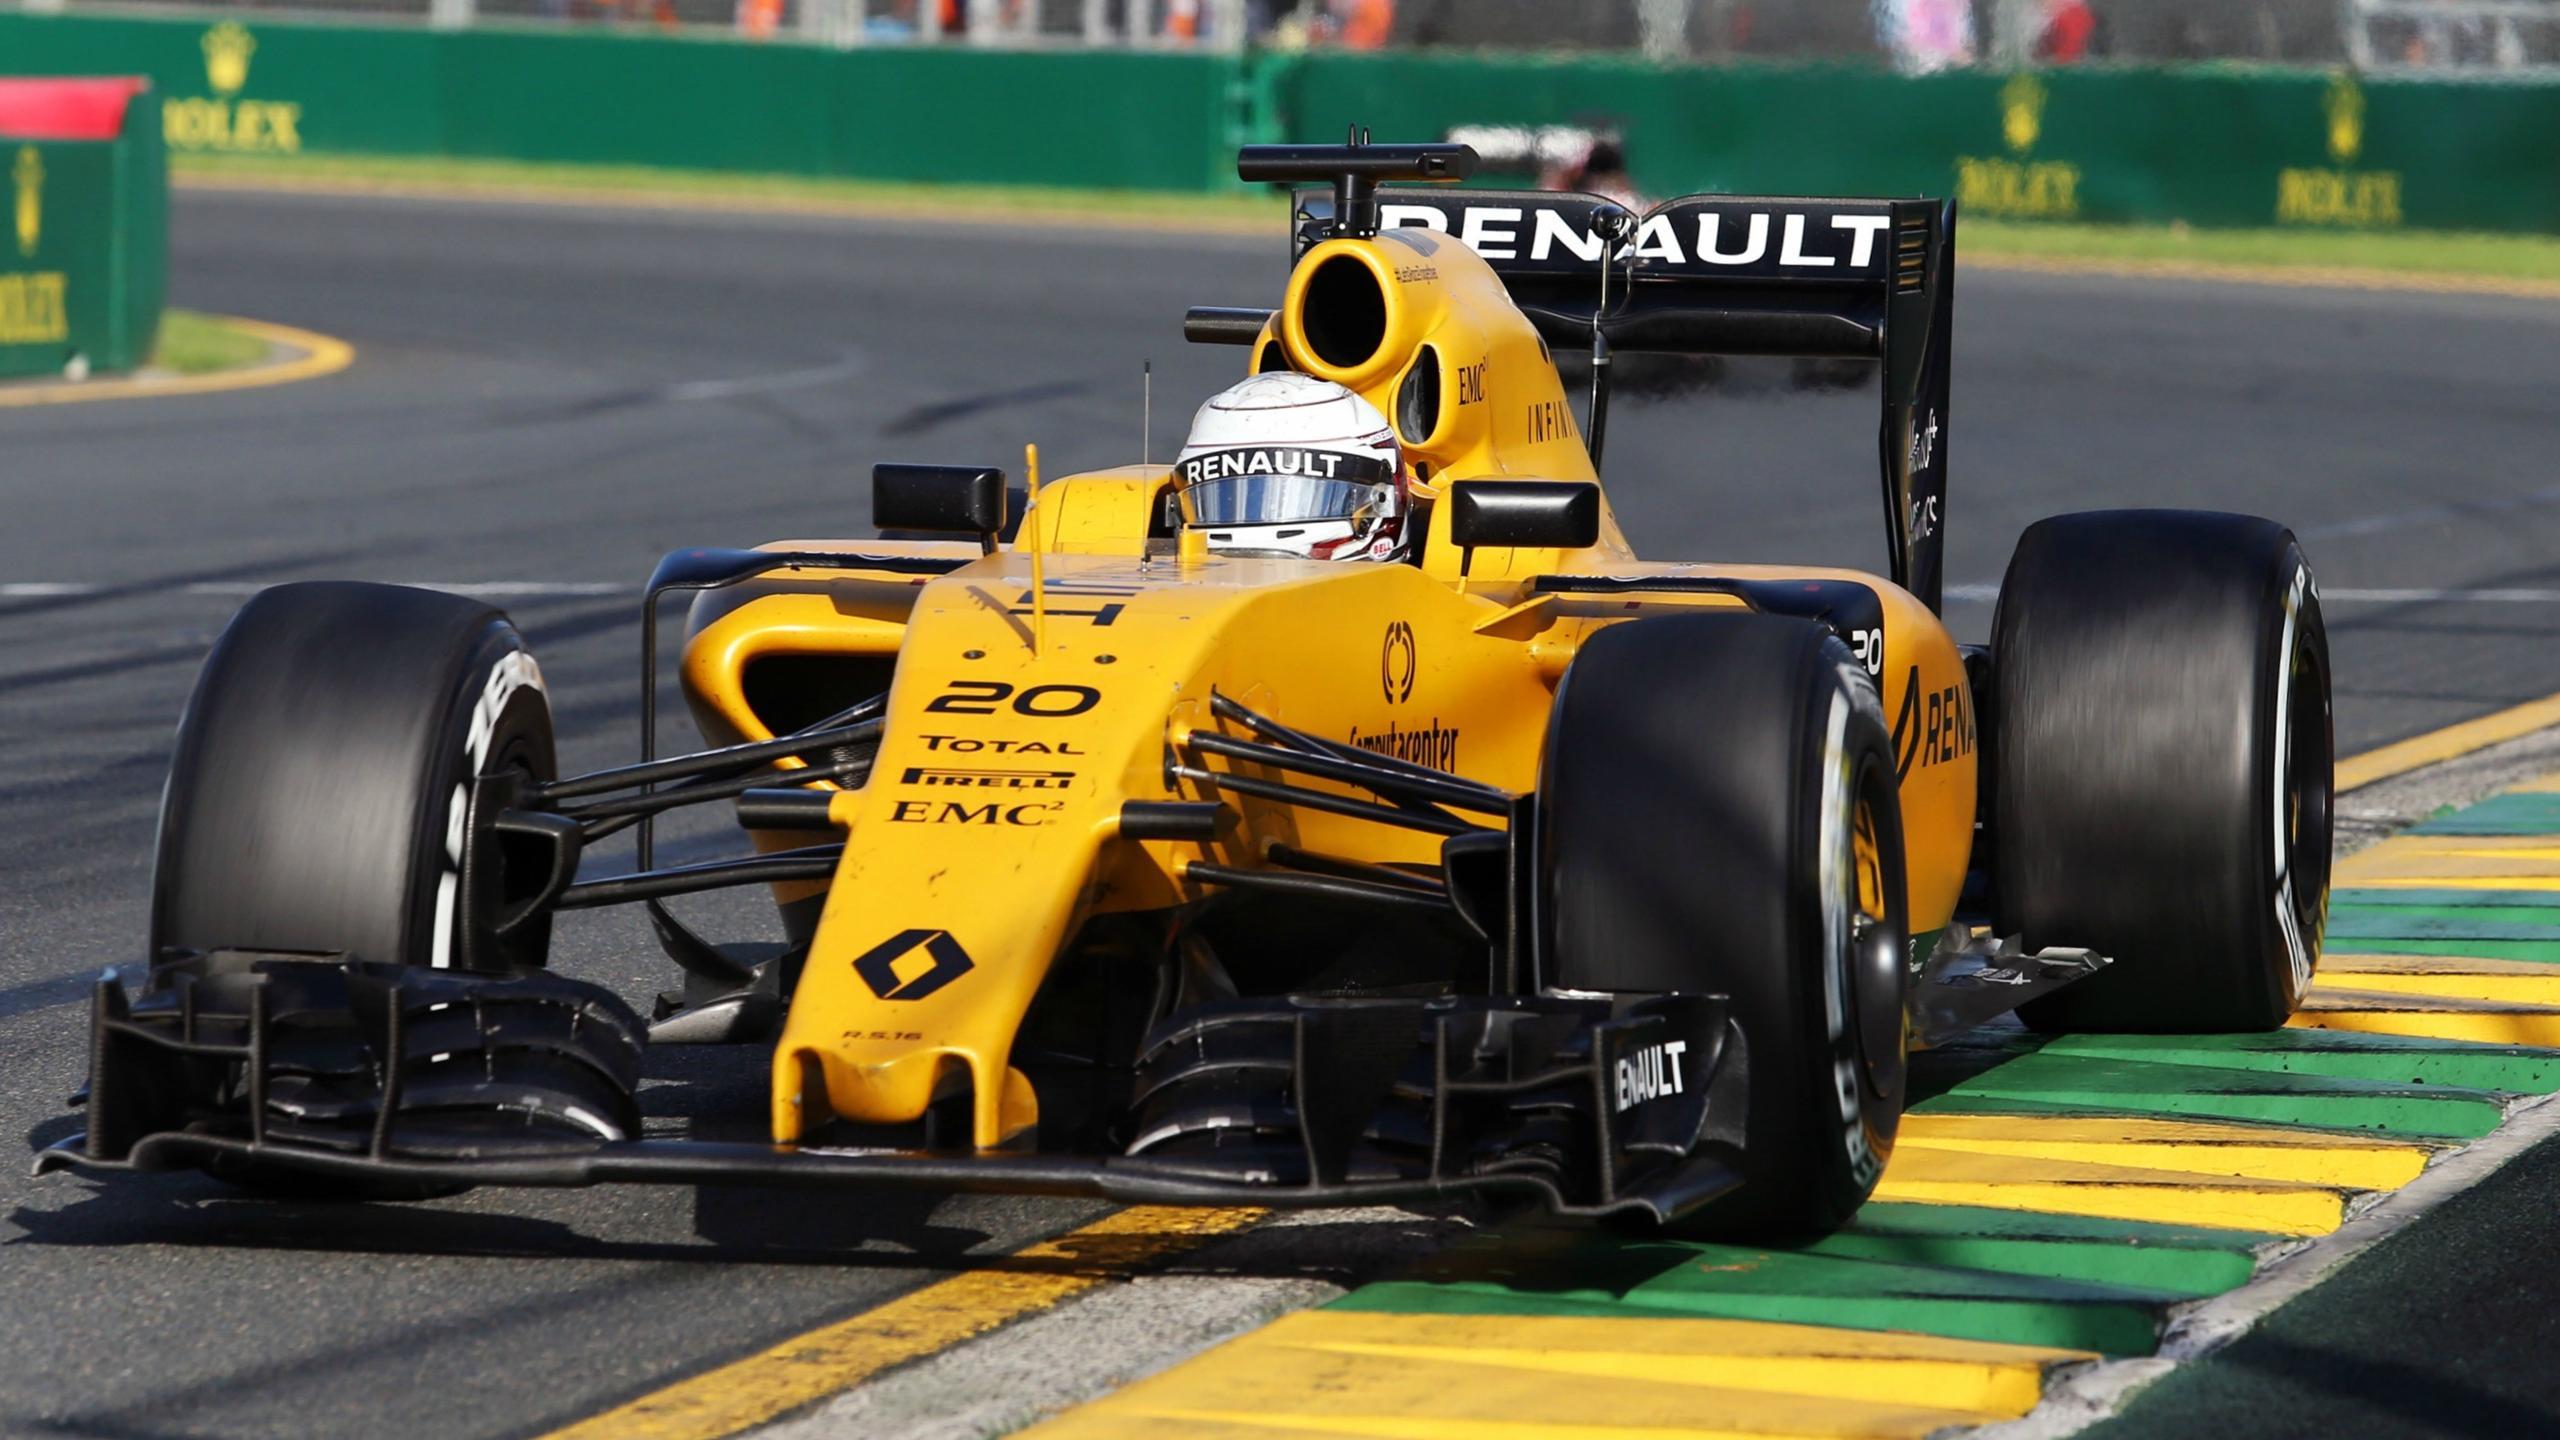 Kevin Magnussen (Renault) - GP of Australia 2016